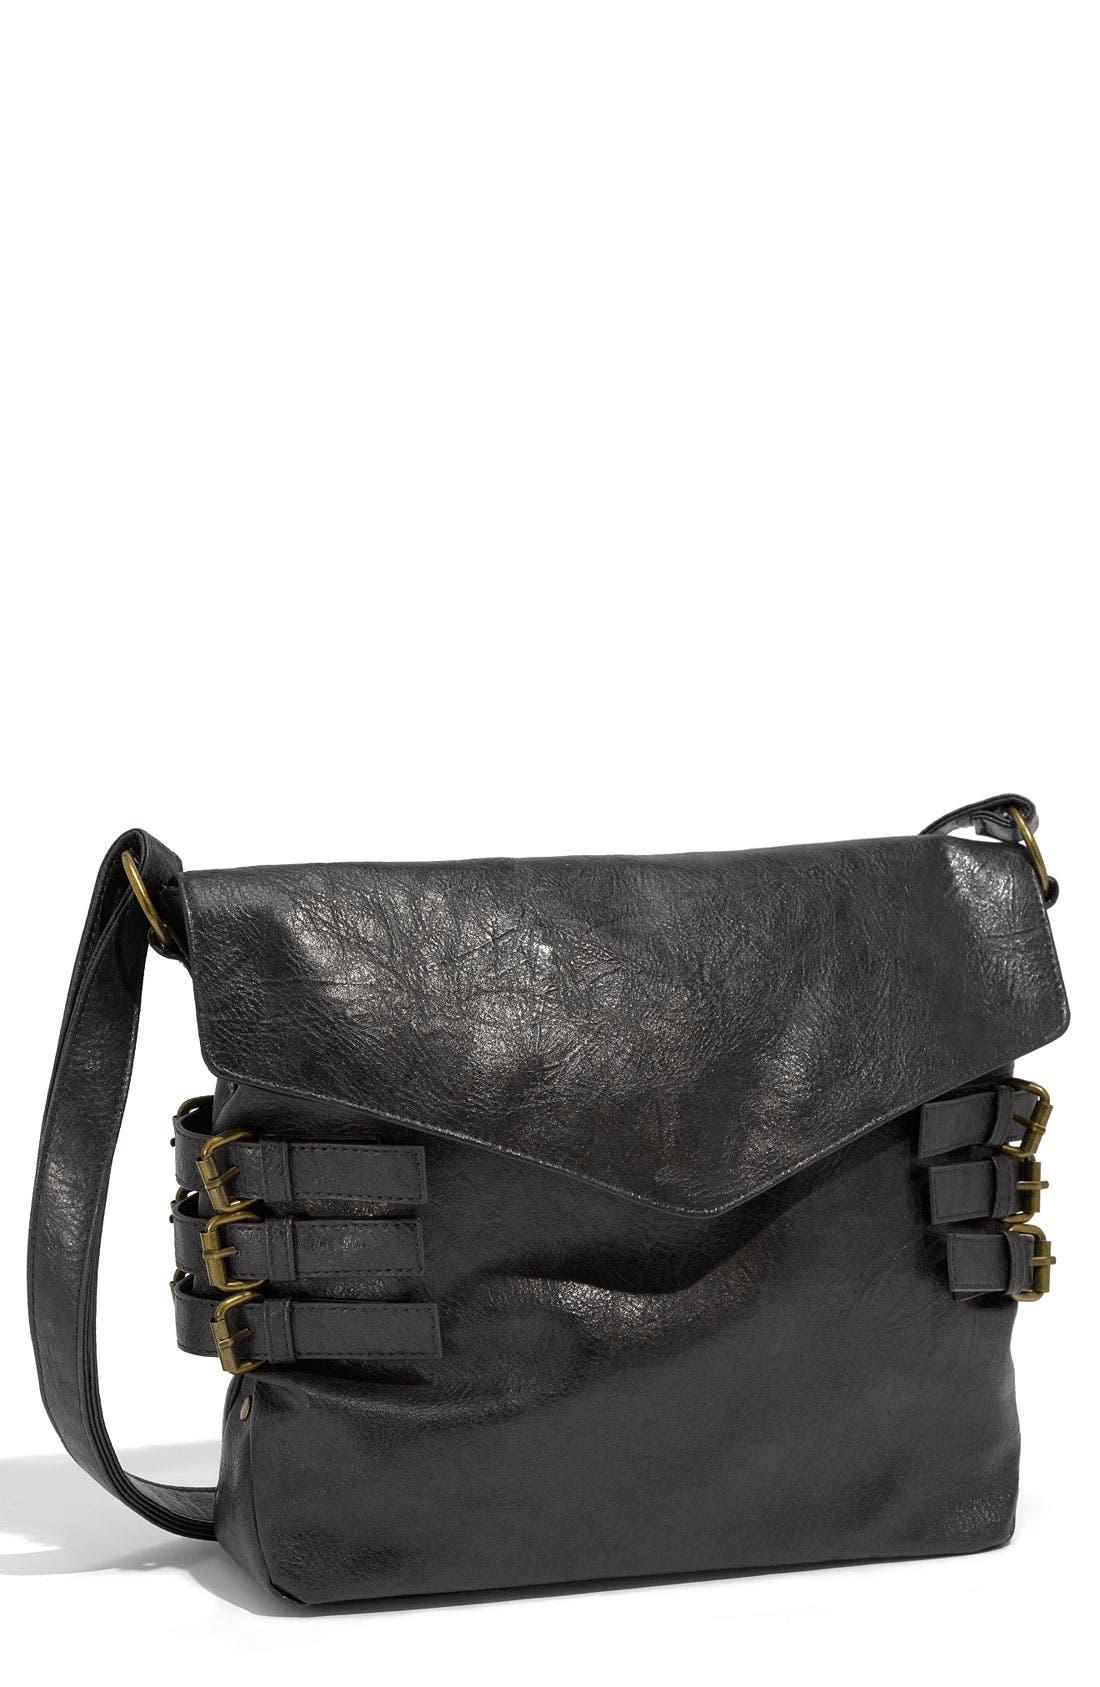 Main Image - Lulu Buckled Envelope Bag